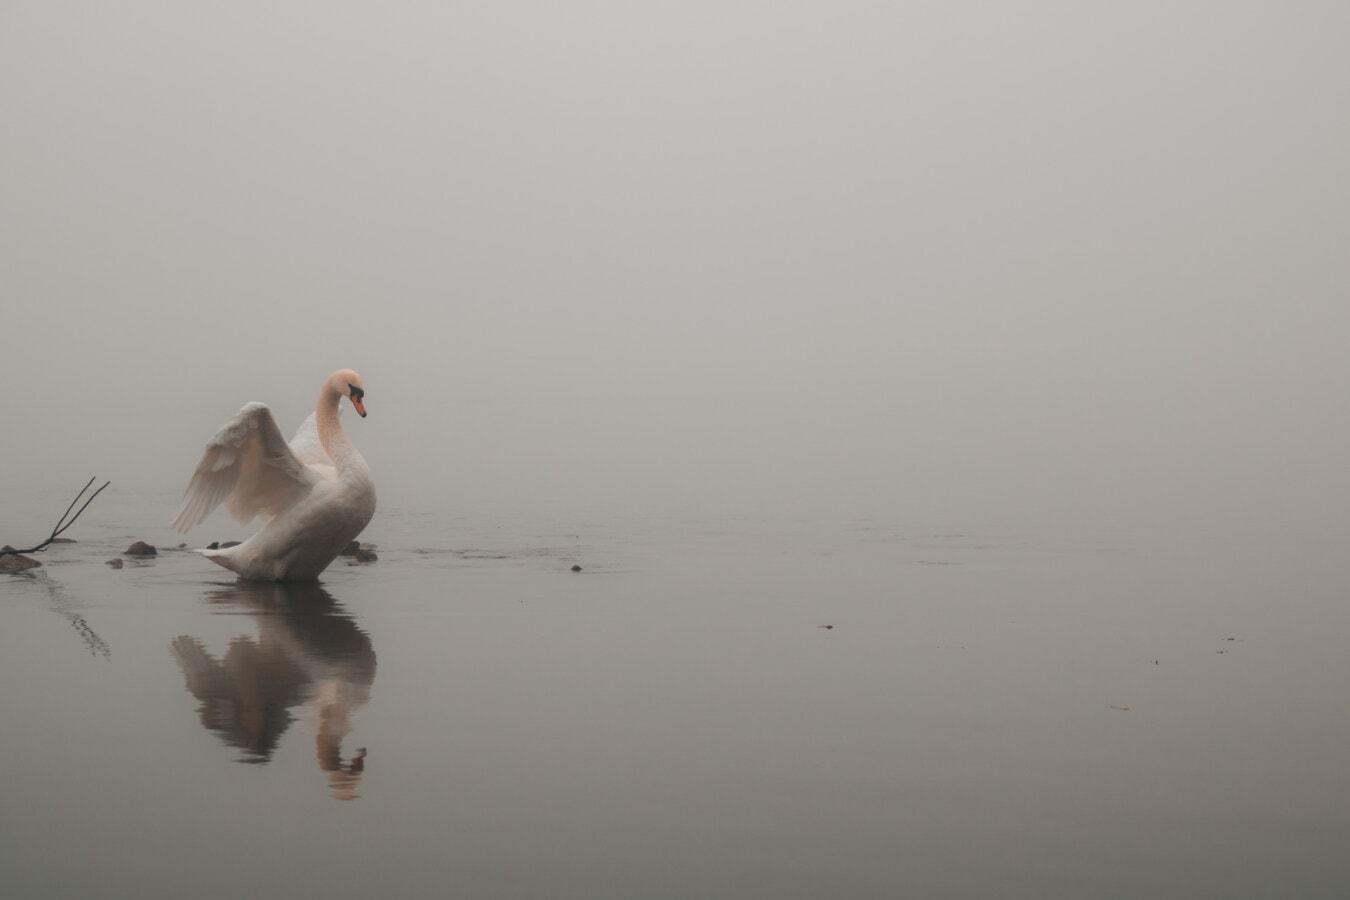 cygne, ailes, majestueux, oiseau, brumeux, matin, brouillard, brume, faune, Lac